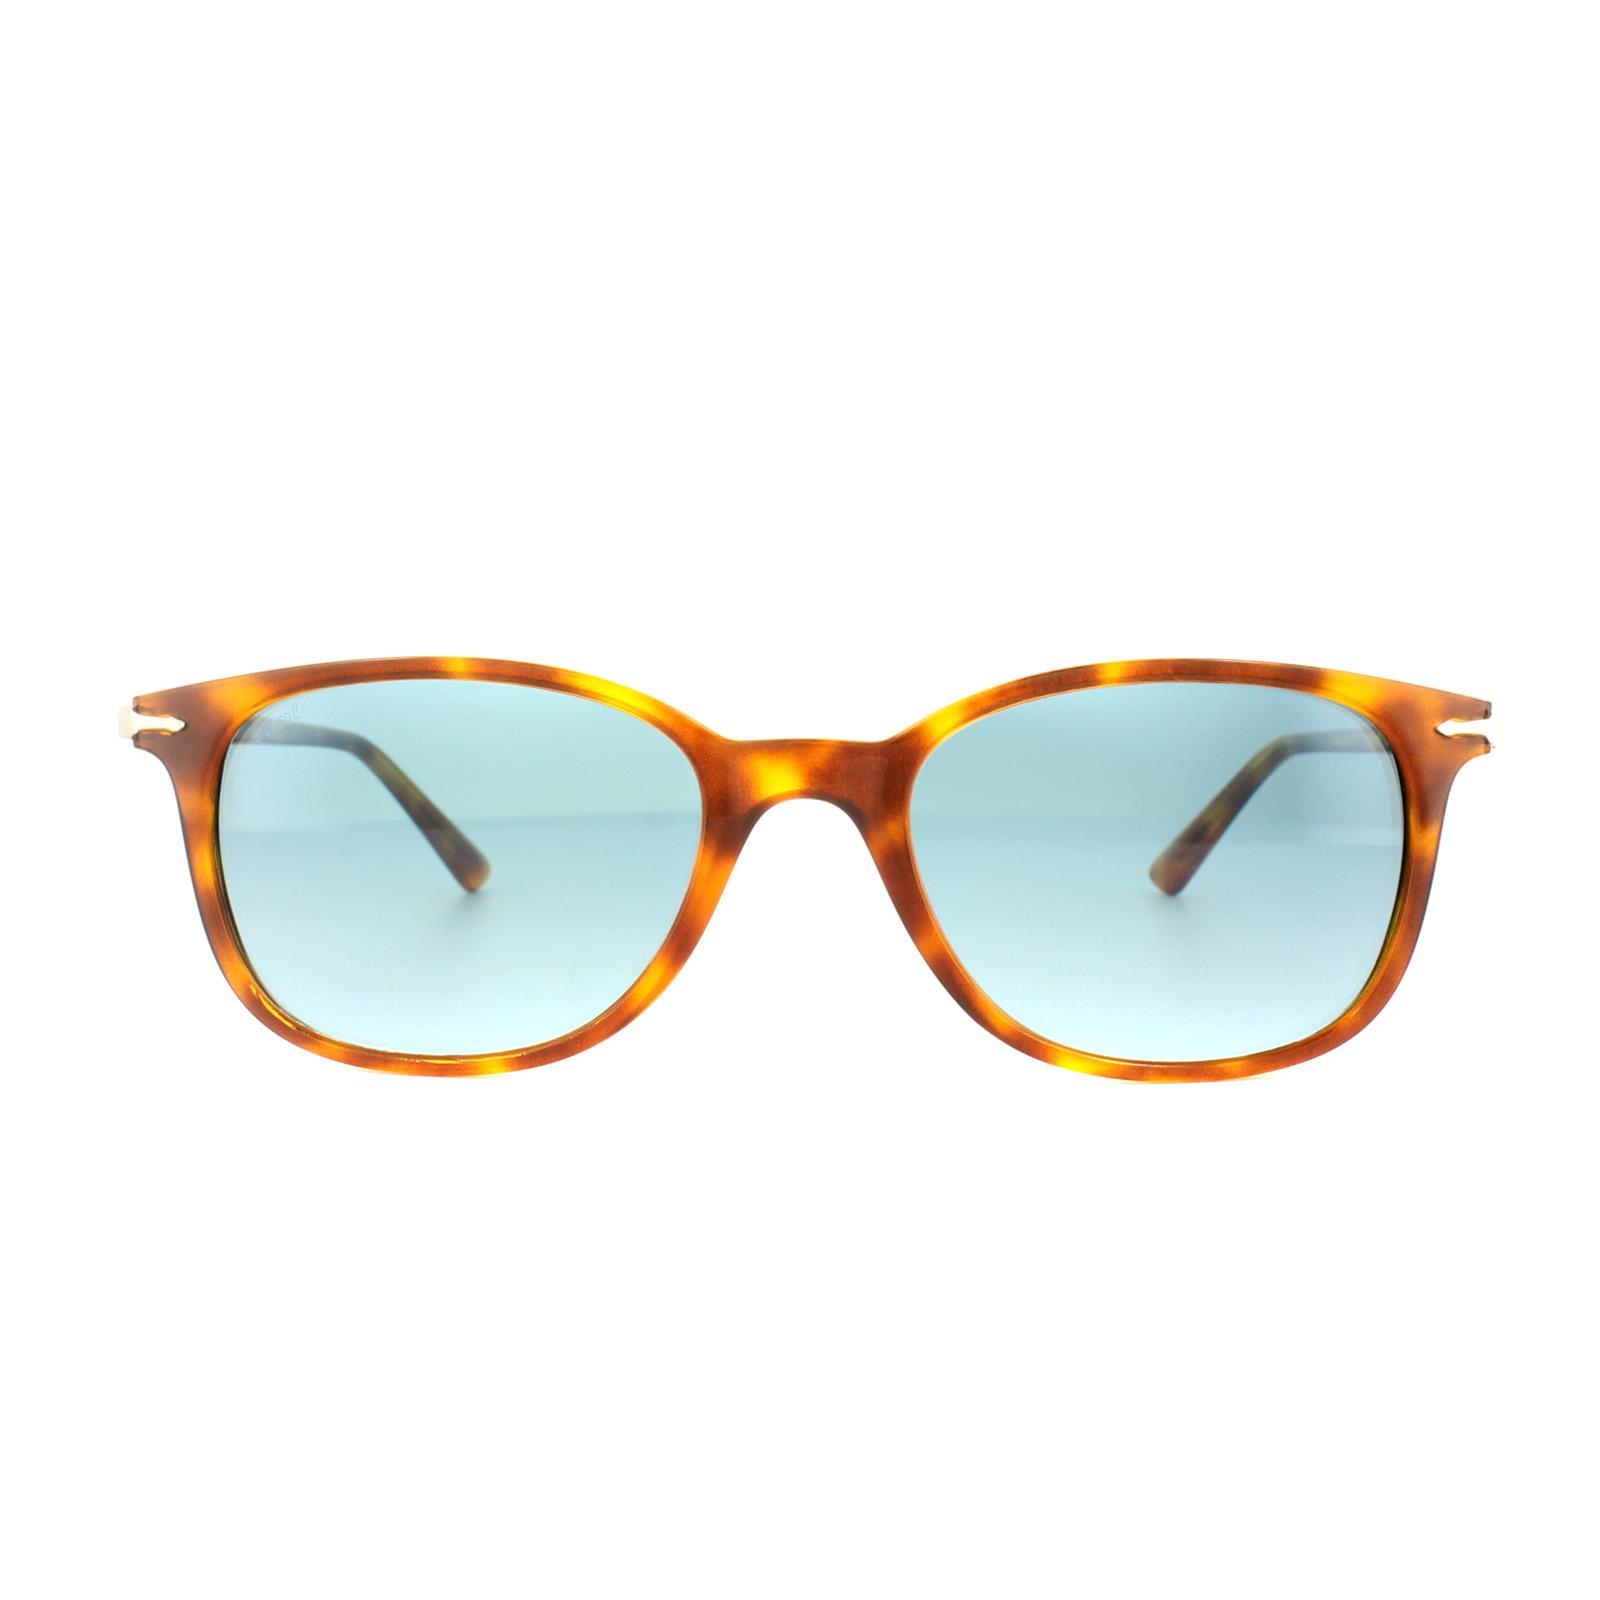 Persol Gafas de sol po3183s 1052q8 Havana Claro Azul Celeste ...